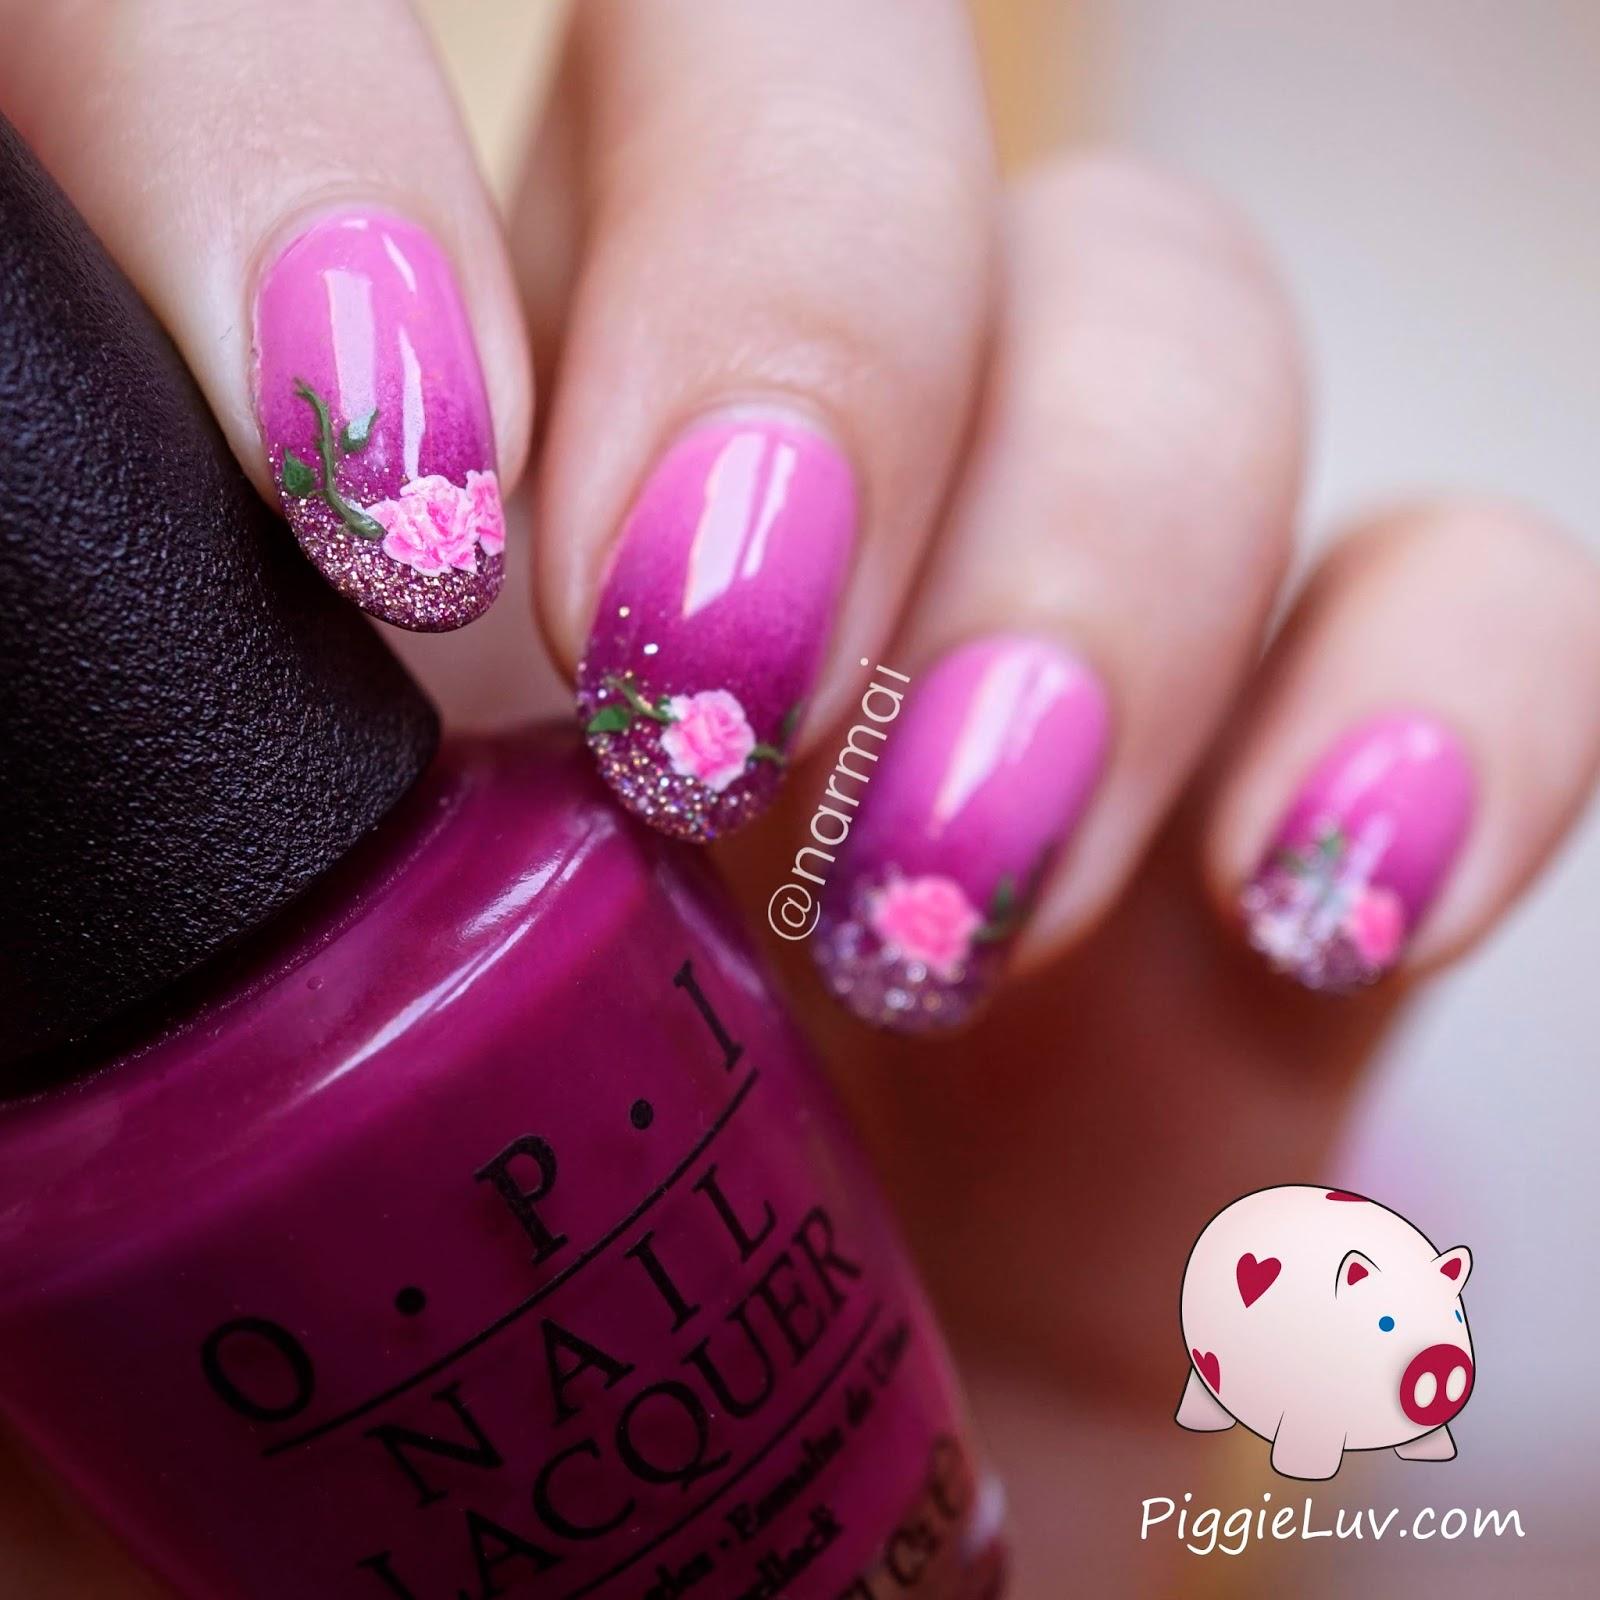 PiggieLuv: Freehand roses nail art for Valentine